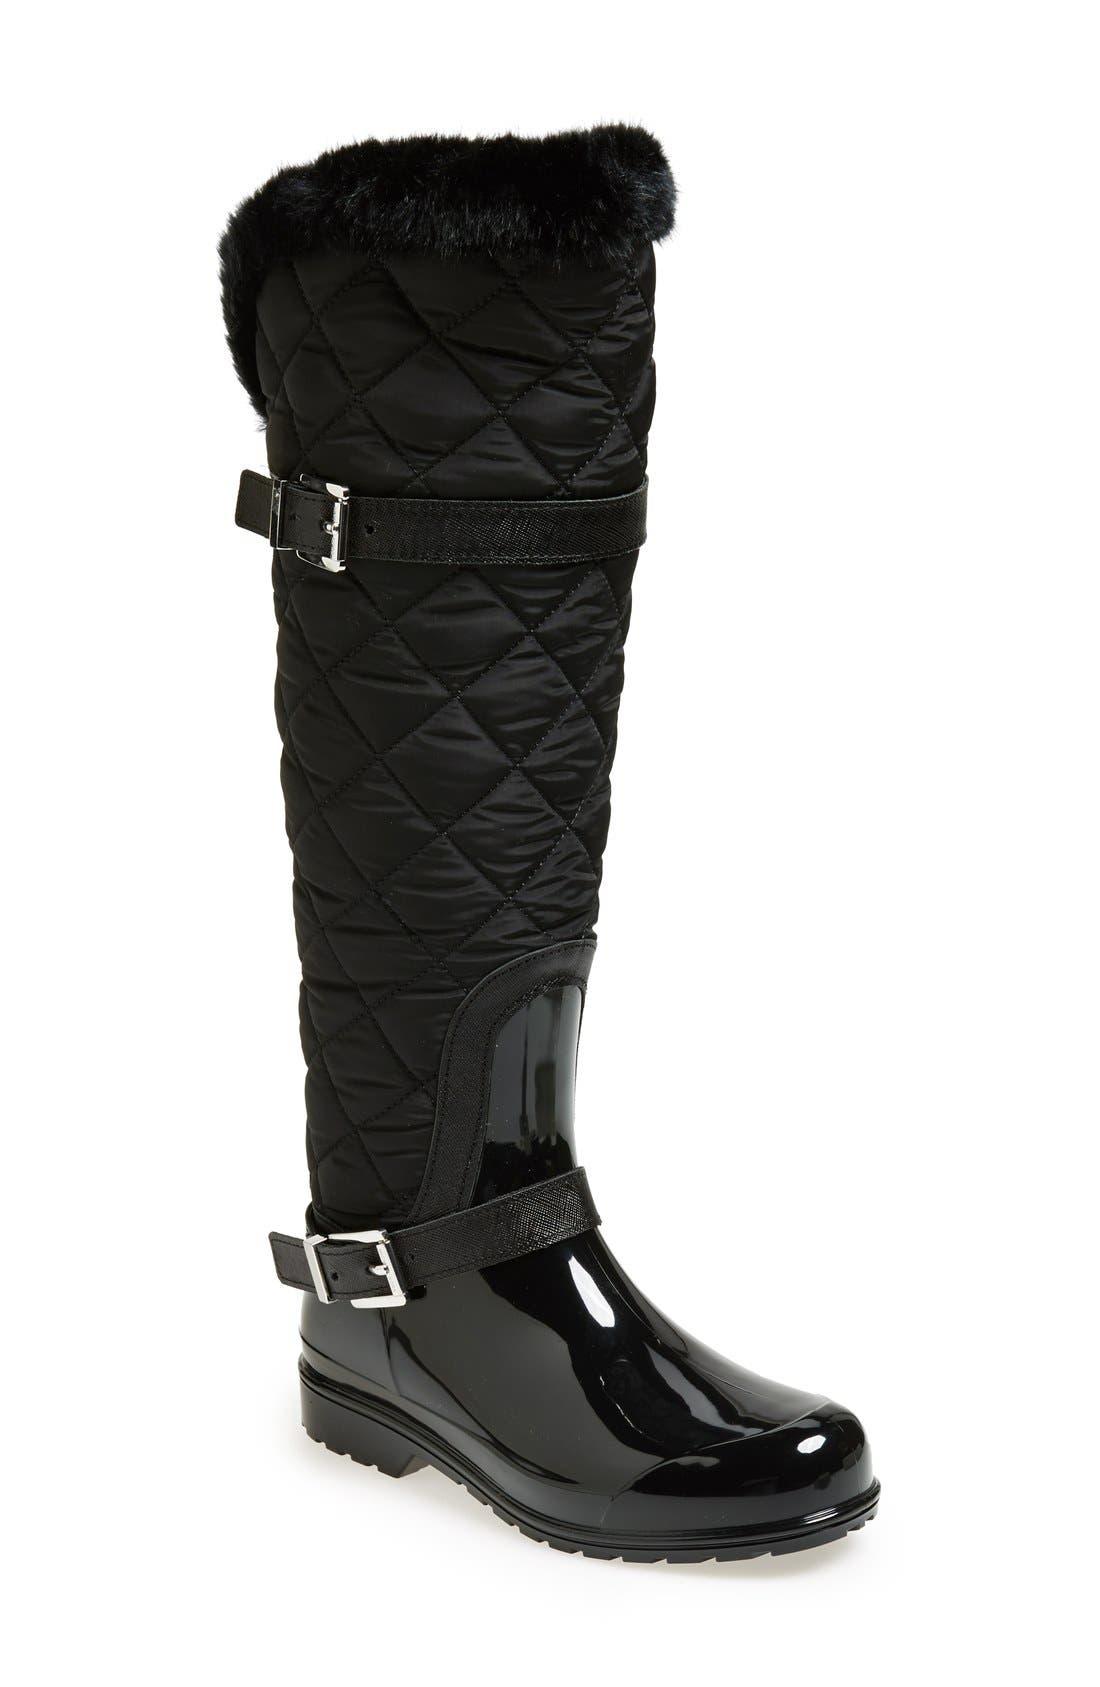 Alternate Image 1 Selected - MICHAEL Michael Kors 'Fulton' Quilted Rain Boot (Women)